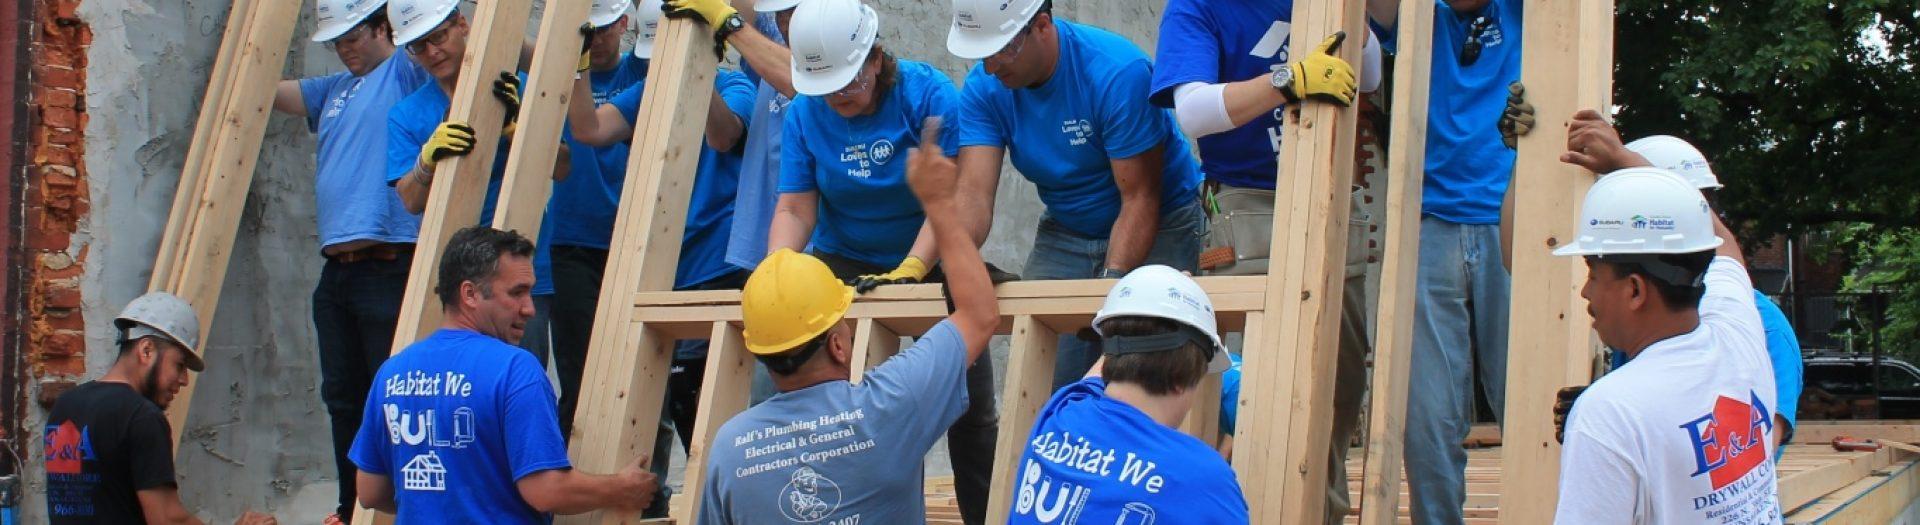 Habitat for Humanity Camden County NJ - Volunteer Day